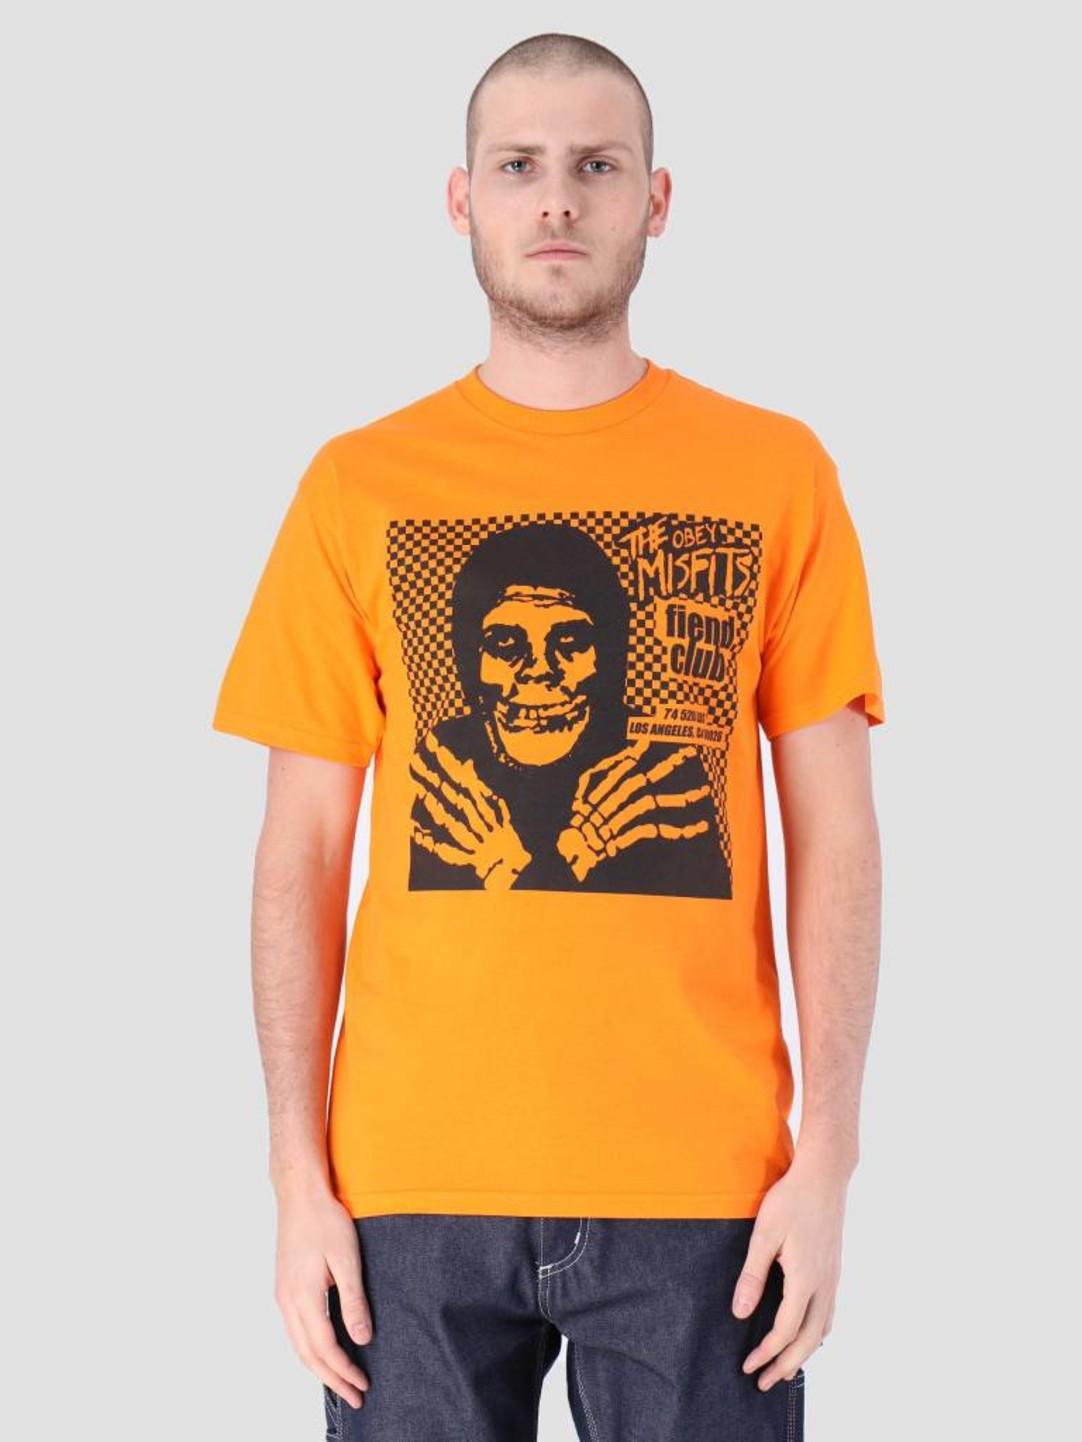 Obey Obey Misfits Fiend Club Hallow Basic T-Shirt Orange 163082055